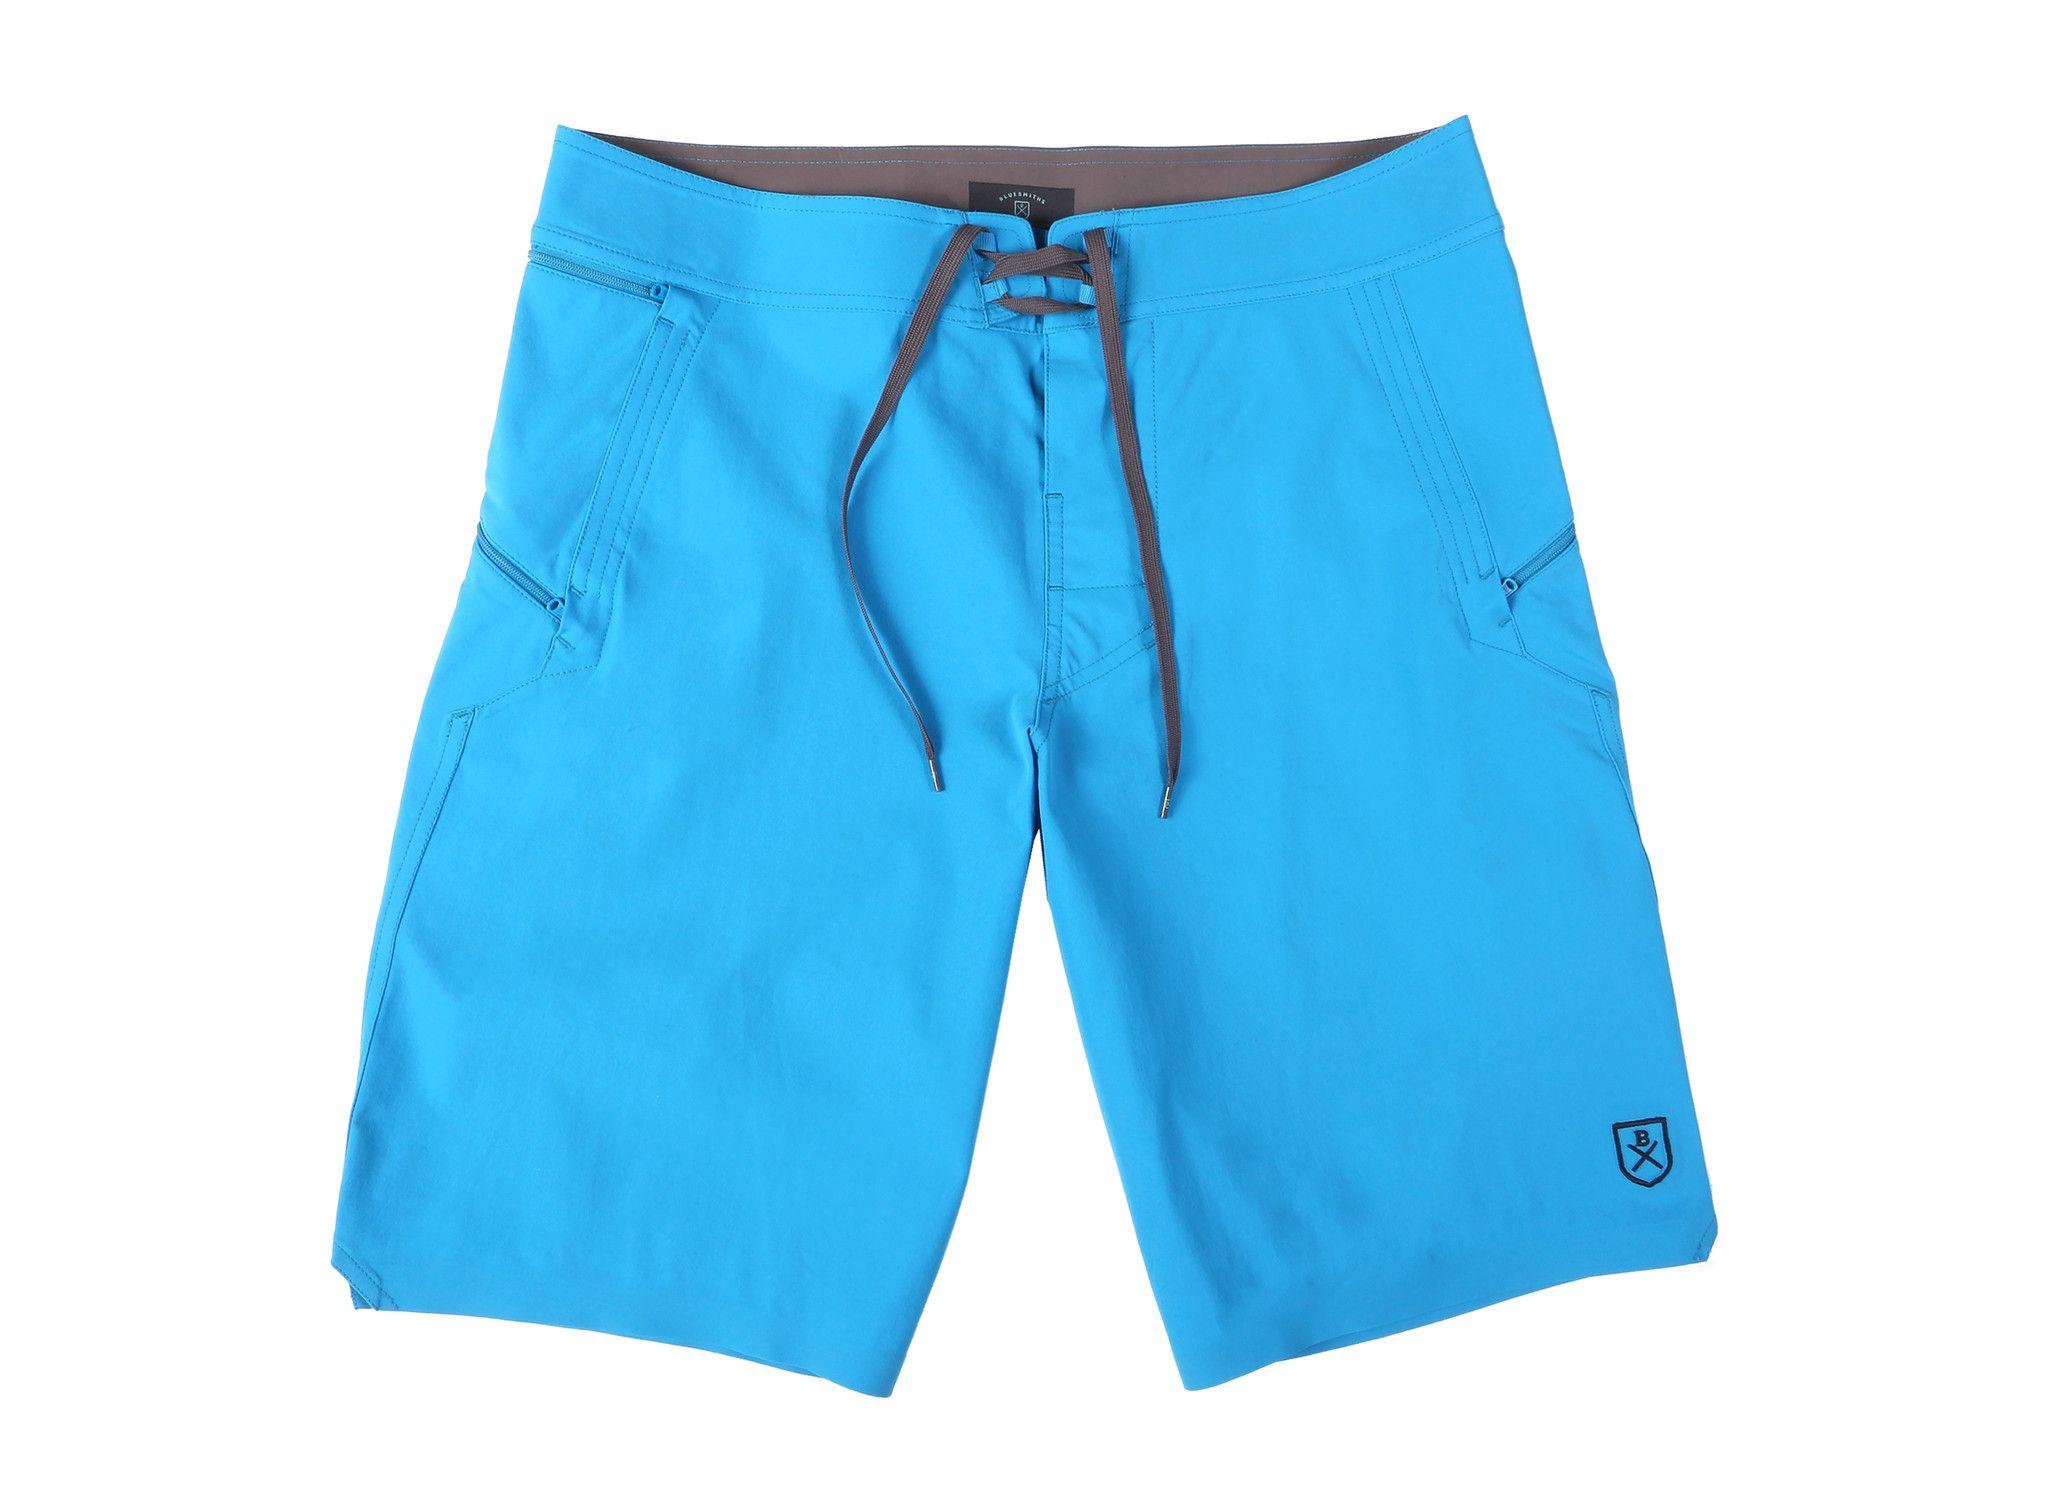 390925879f The Spartan Board Shorts in Hawaiian Ocean   BLUESMITHS